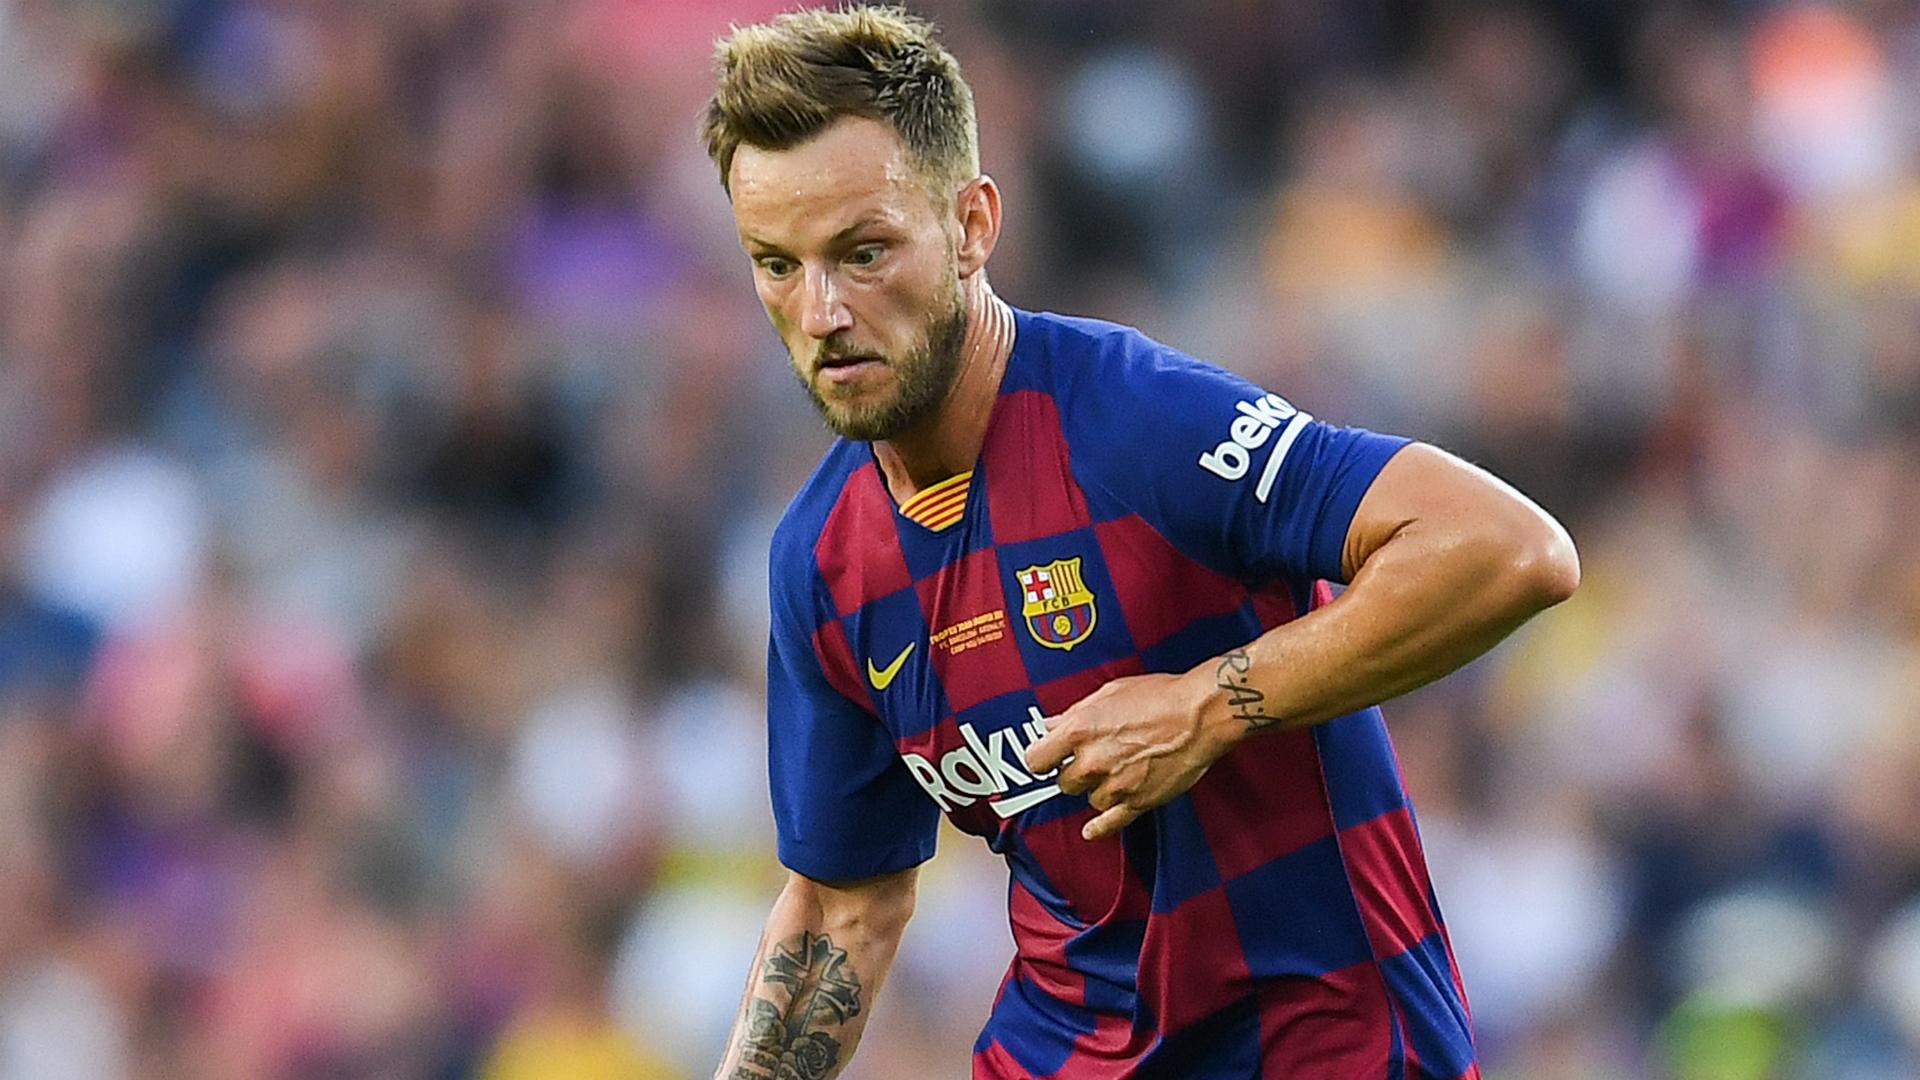 Barcelona 2-1 Napoli: Rakitic punishes Milik howler in Miami